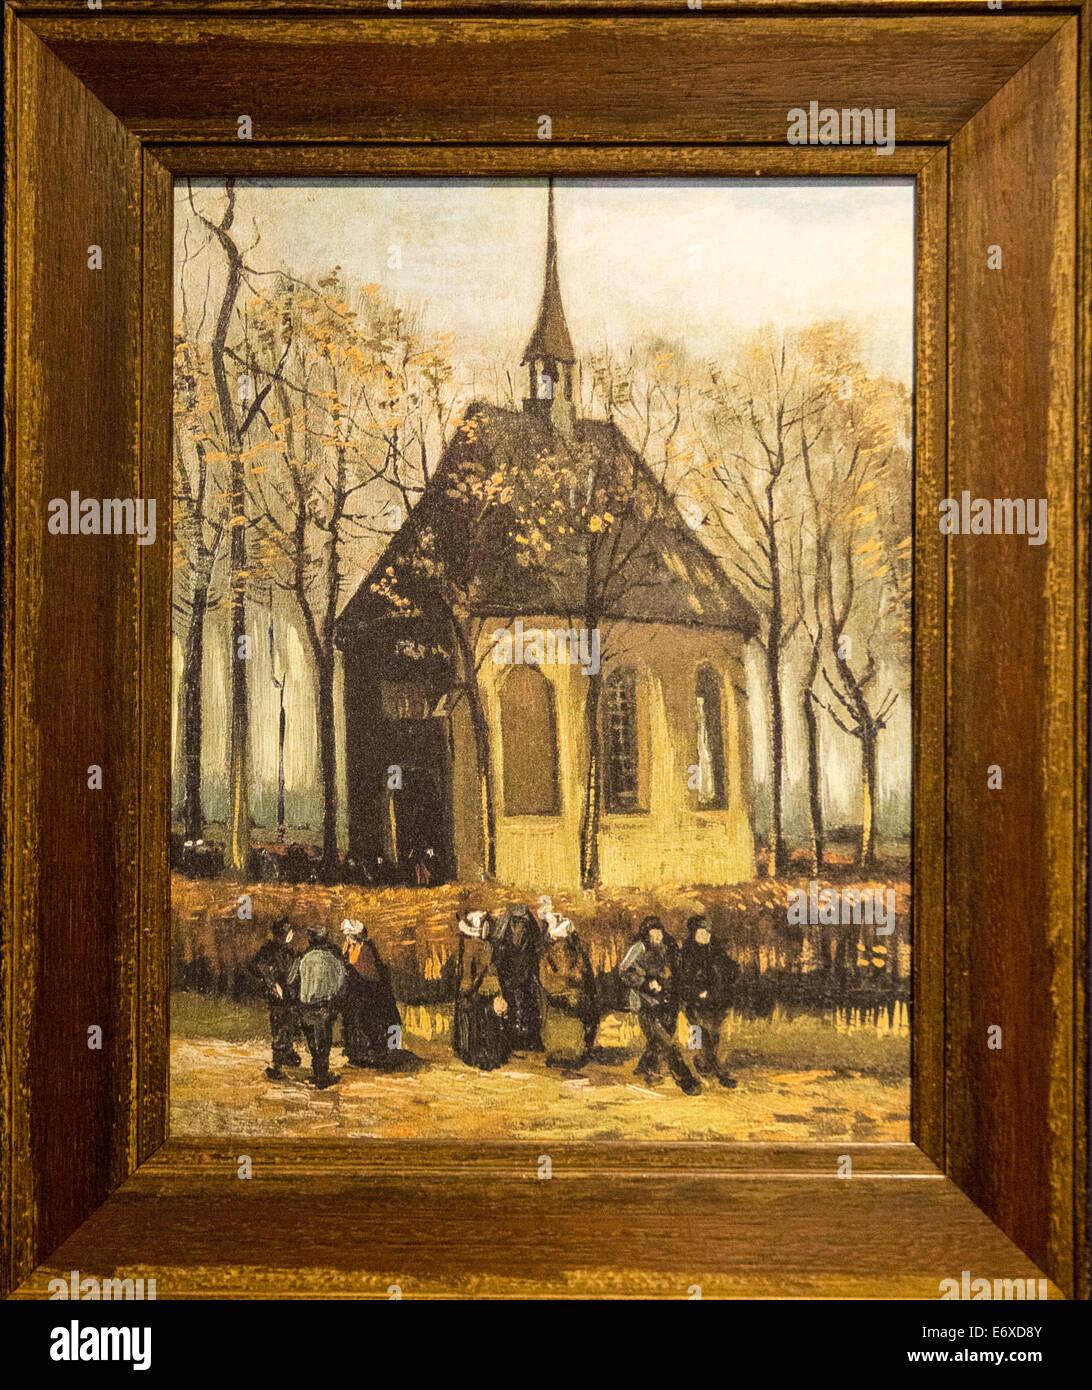 Netherlands, Nuenen, Village of Vincent van Gogh, Museum called Vincentre. Replica of painting of Dutch Reformed - Stock Image